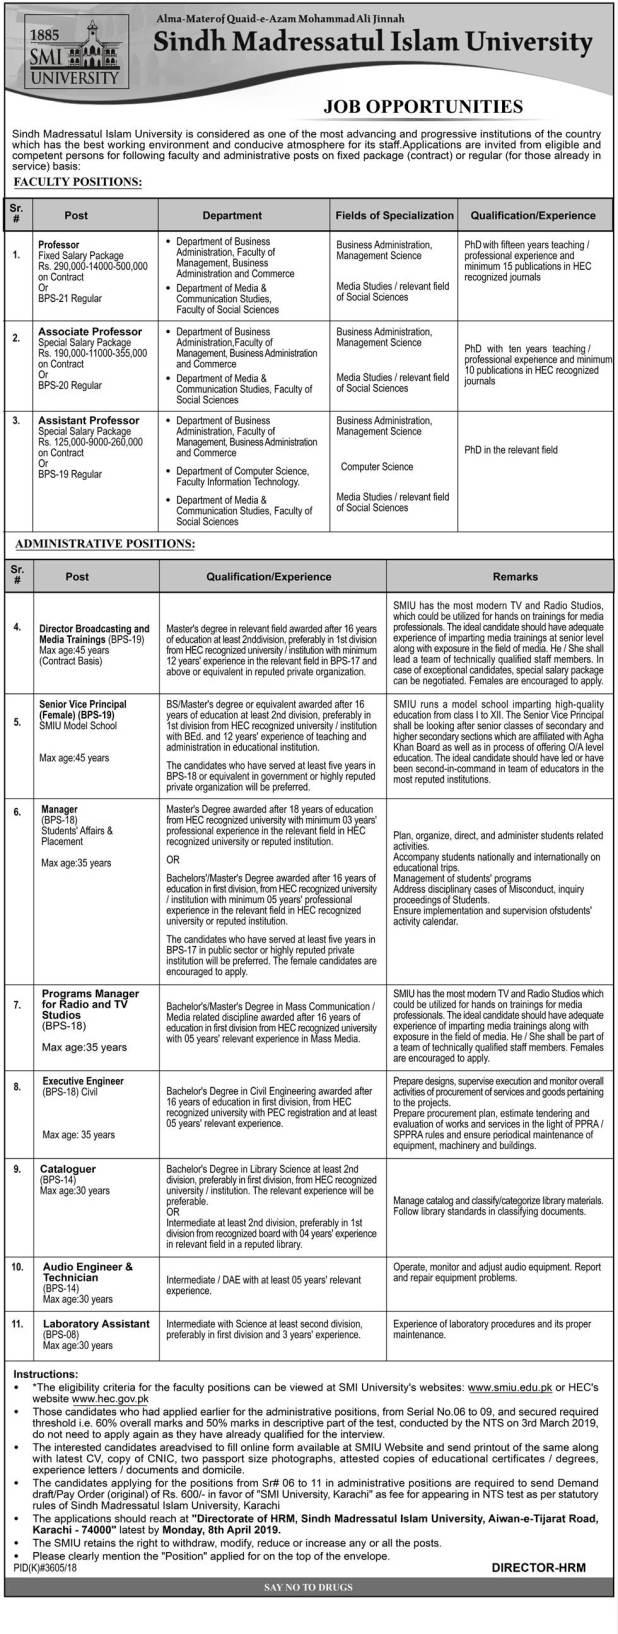 Sindh Madressatul Islam University Karachi Jobs 2021 NTS Application Form Eligibility Criteria